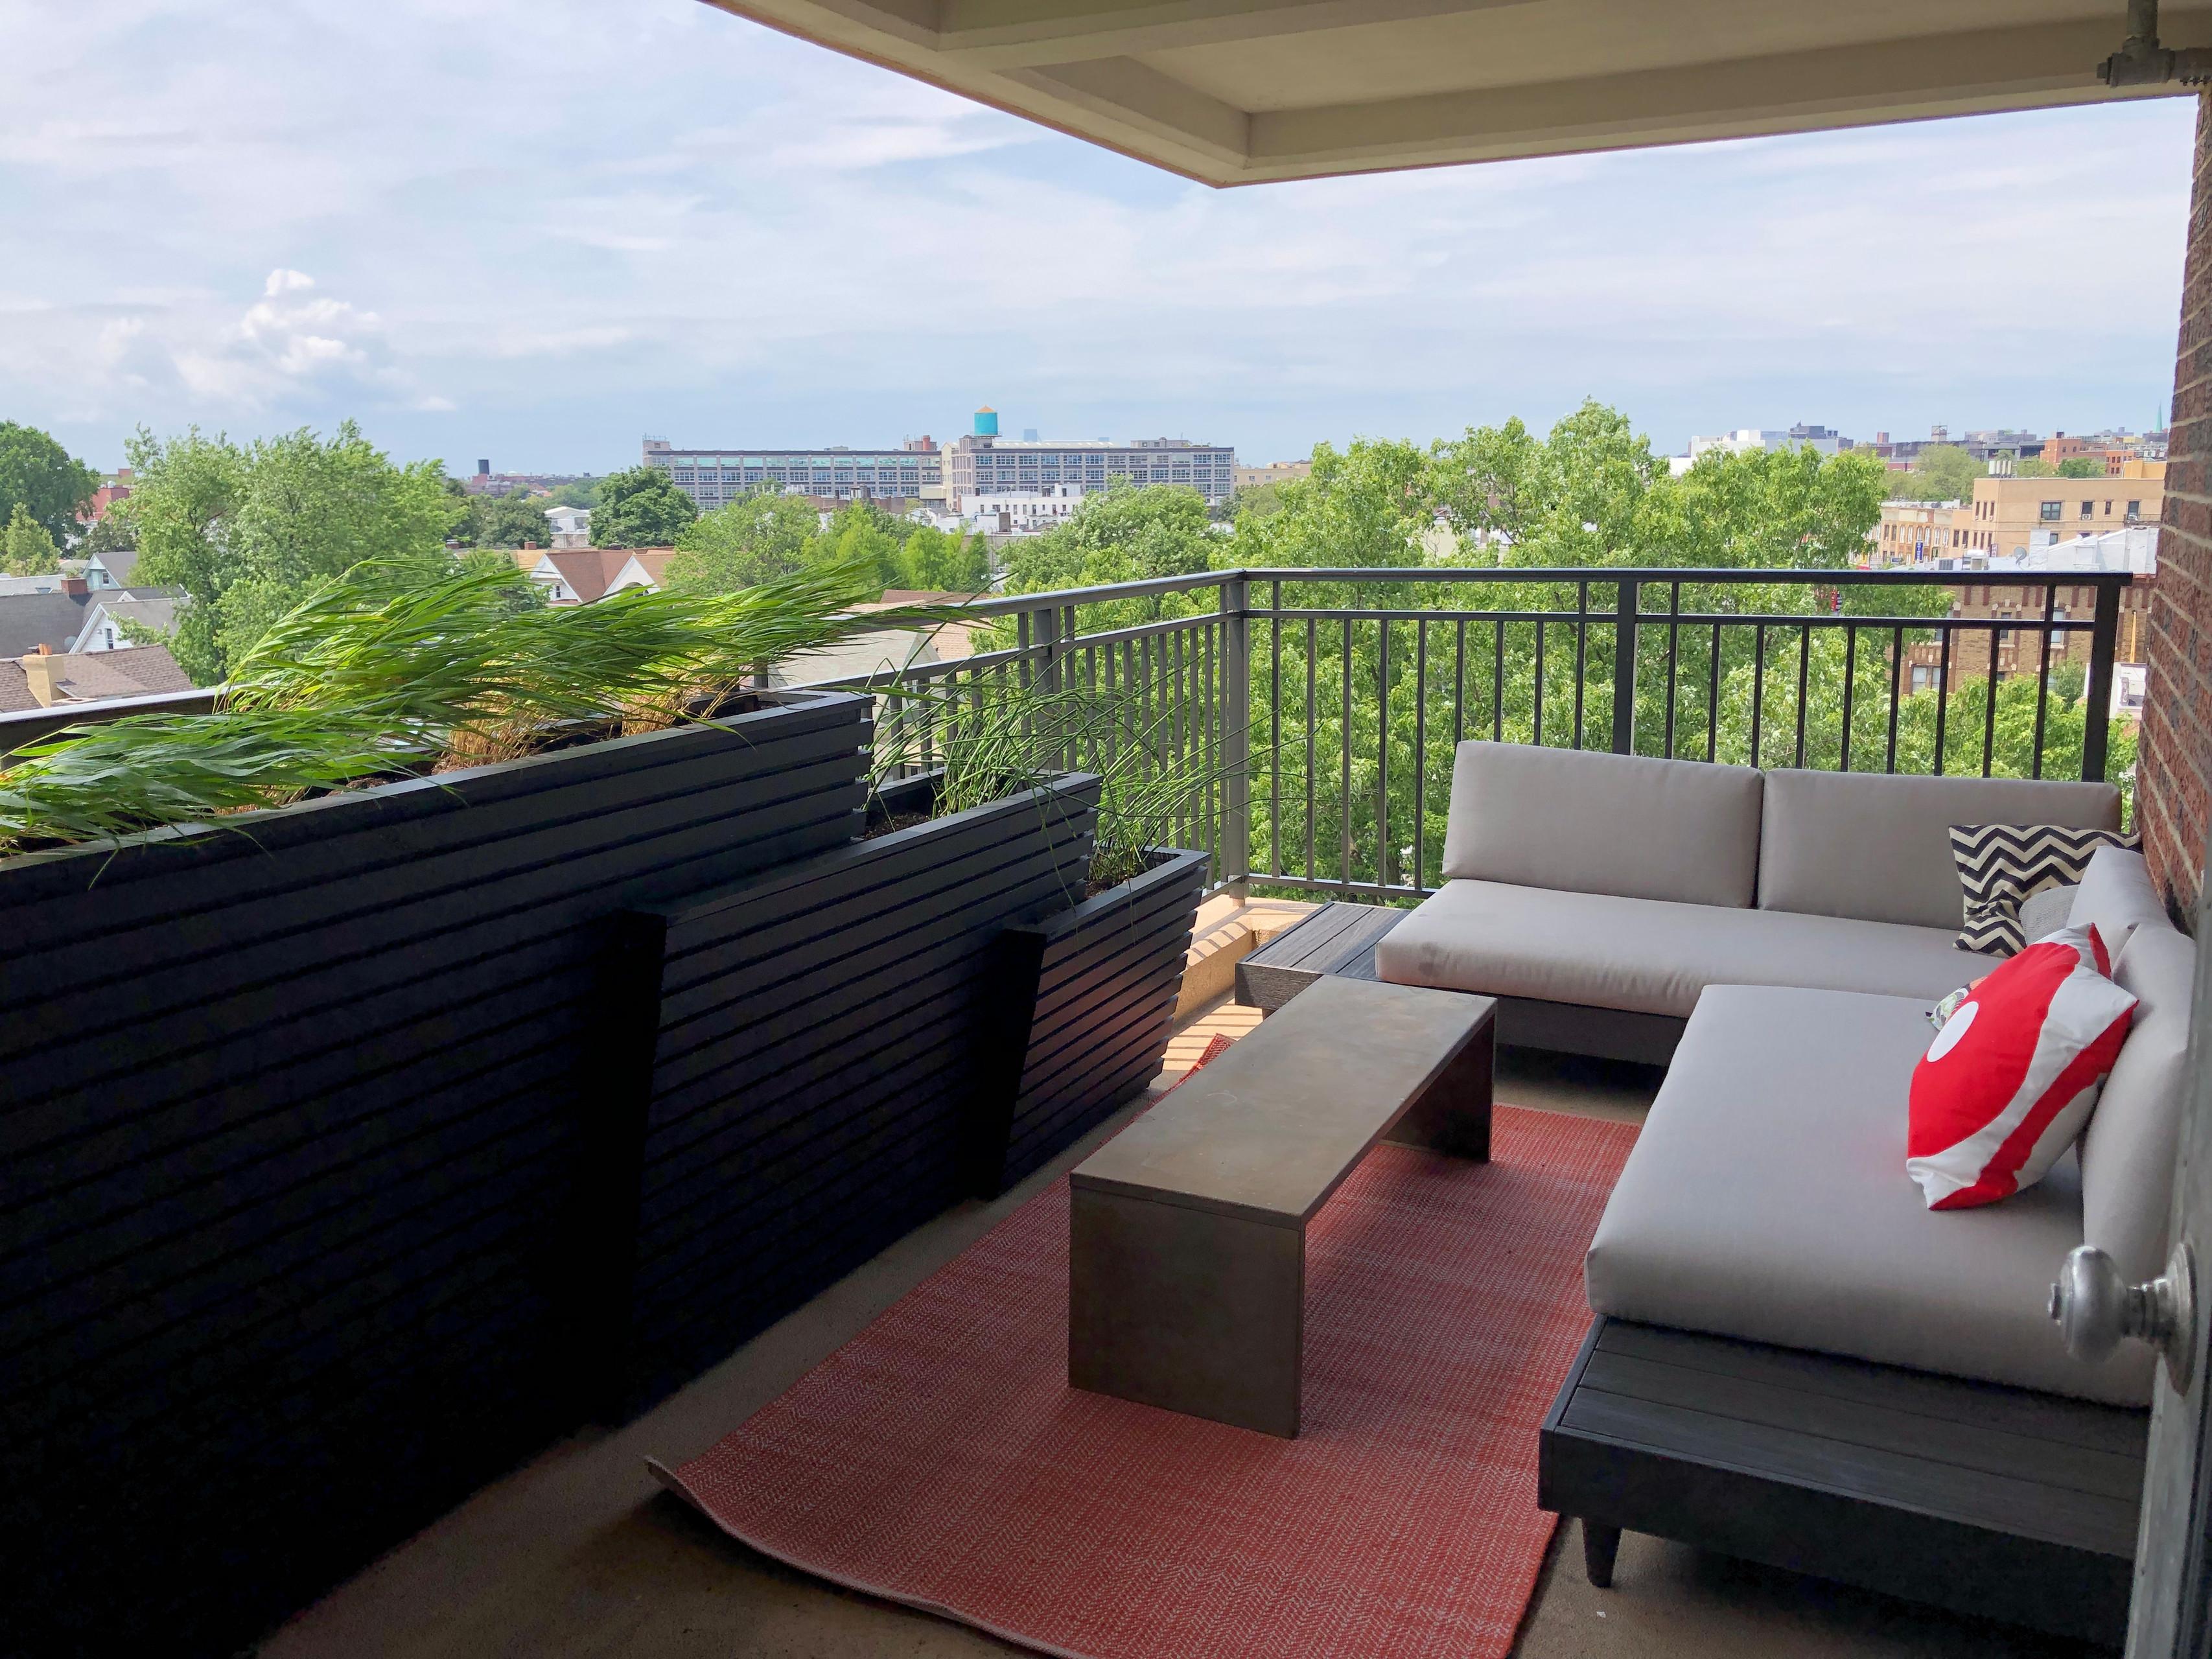 Park Slope Co-op balcony